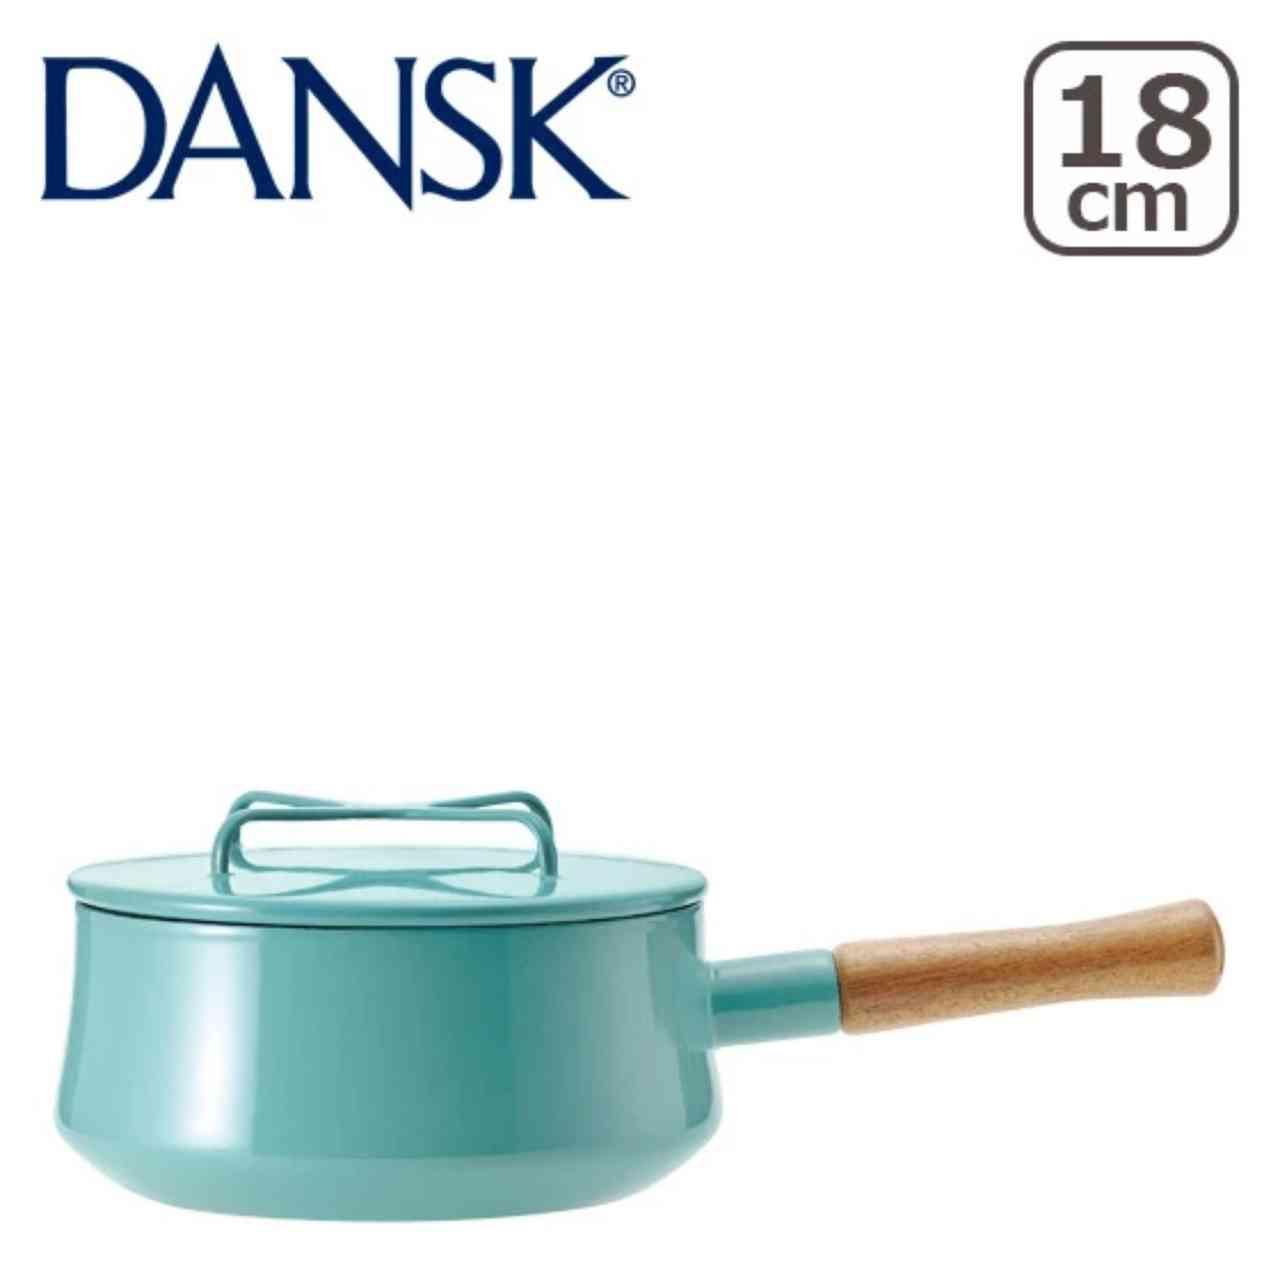 DANSK(ダンスク)のホーロー片手鍋 18㎝